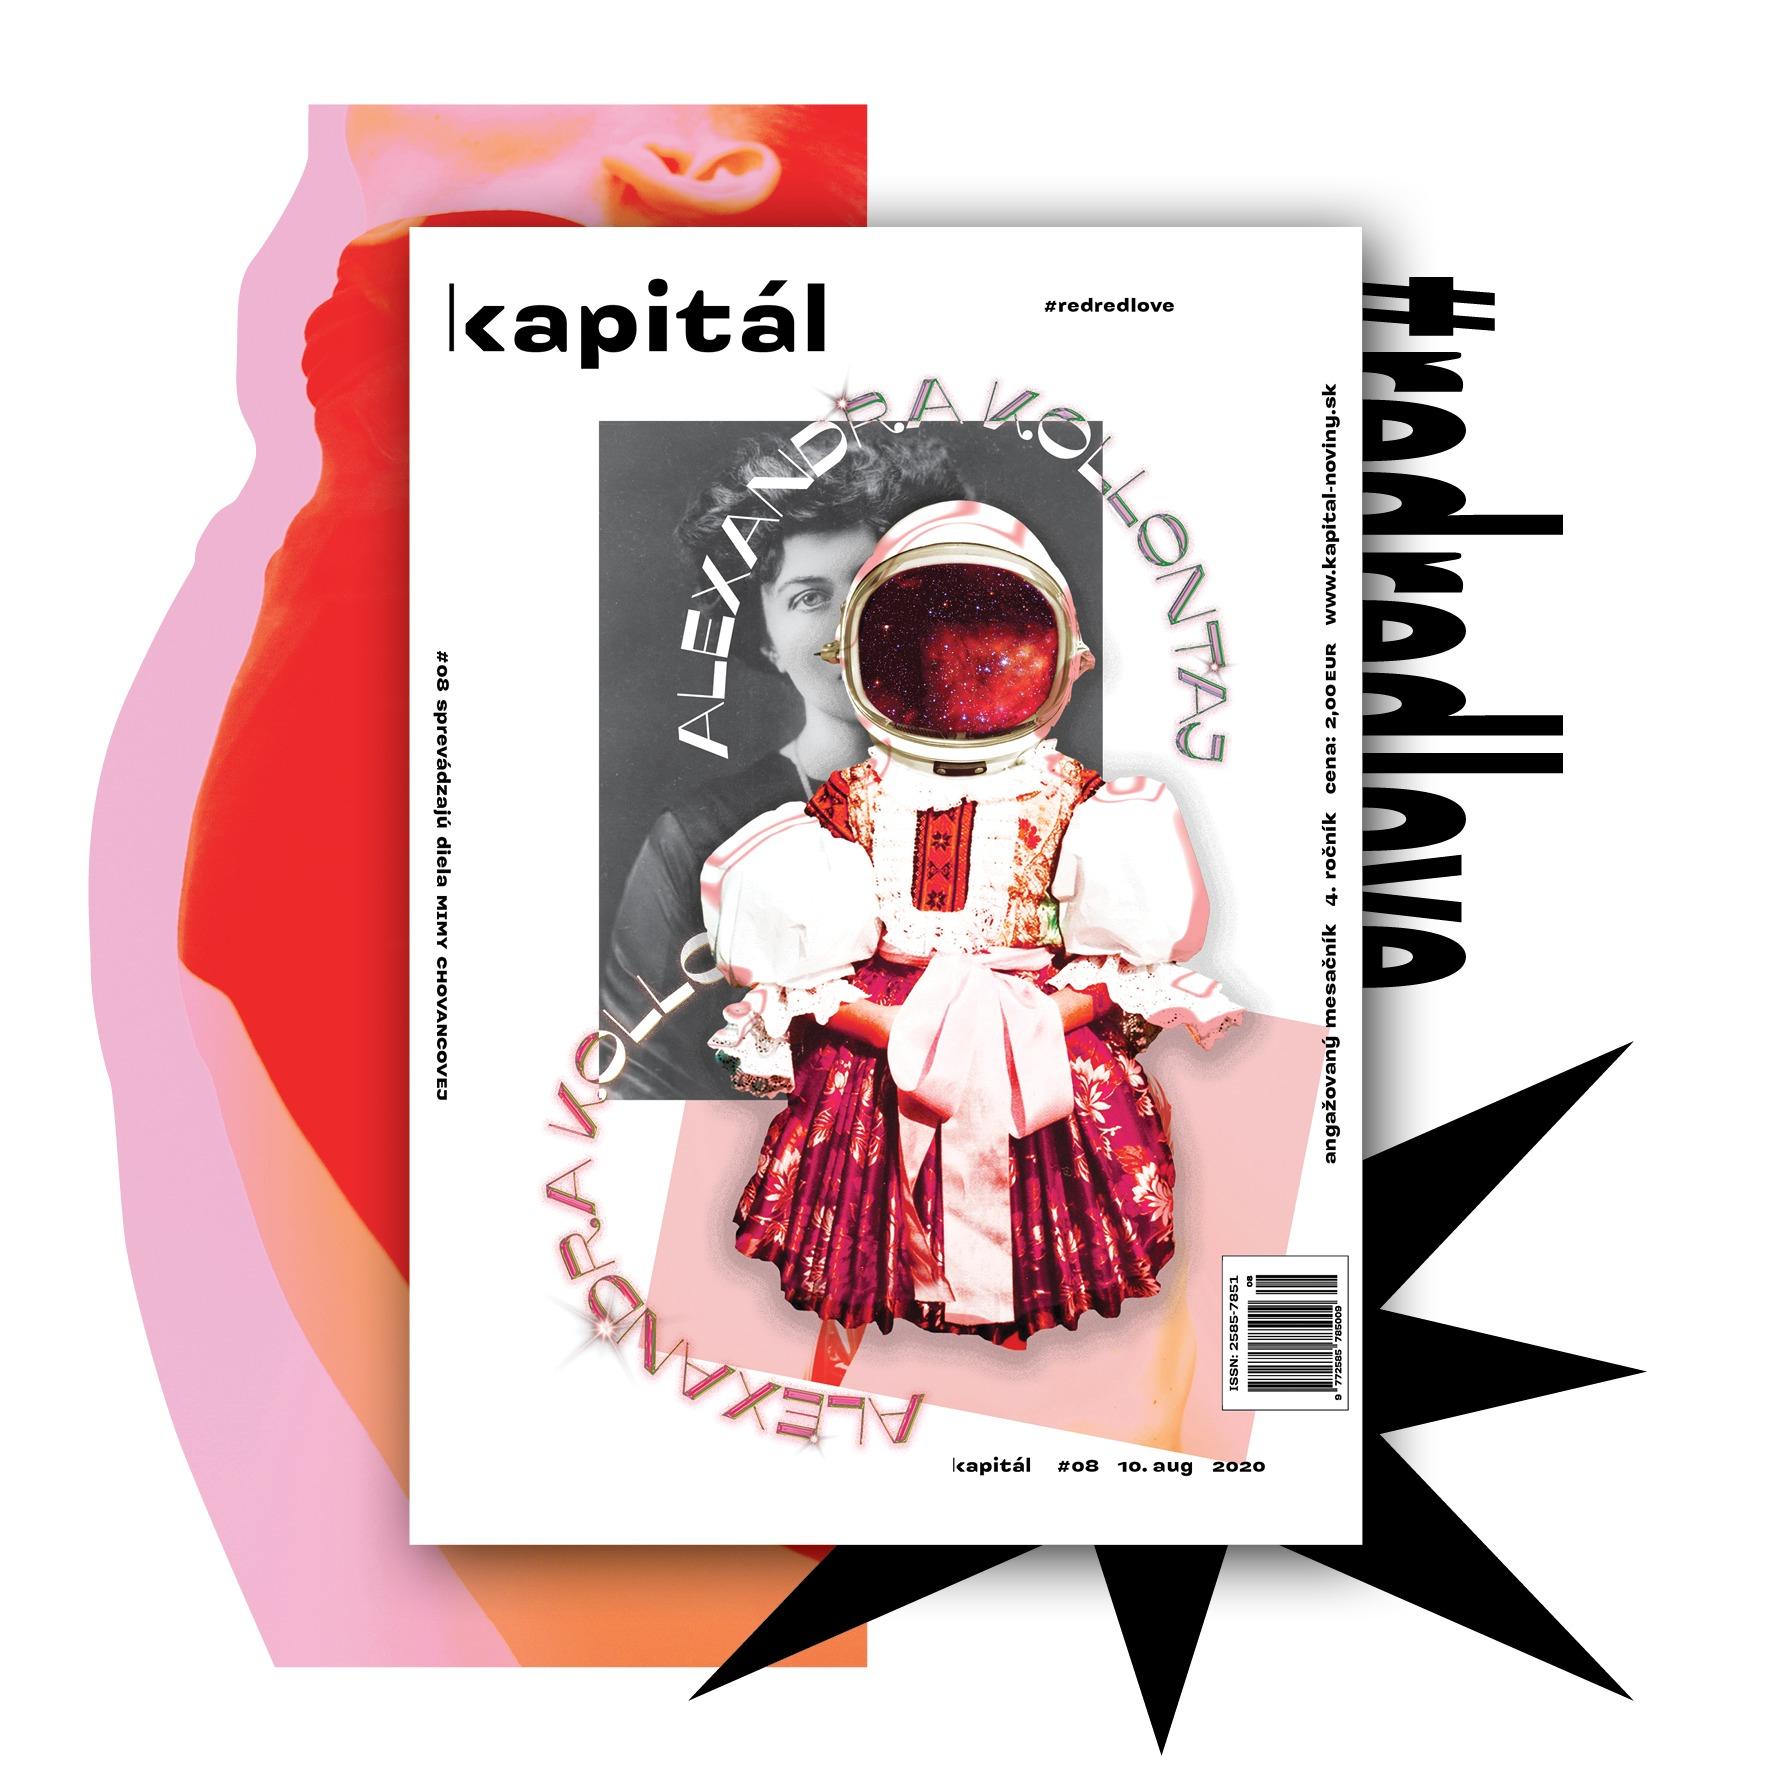 https://kapital-noviny.sk/wp-content/uploads/2020/08/KAPITAL-WEB_PROFILOVKY-CISIEL_2020_08_KOLLONTAJ.jpg